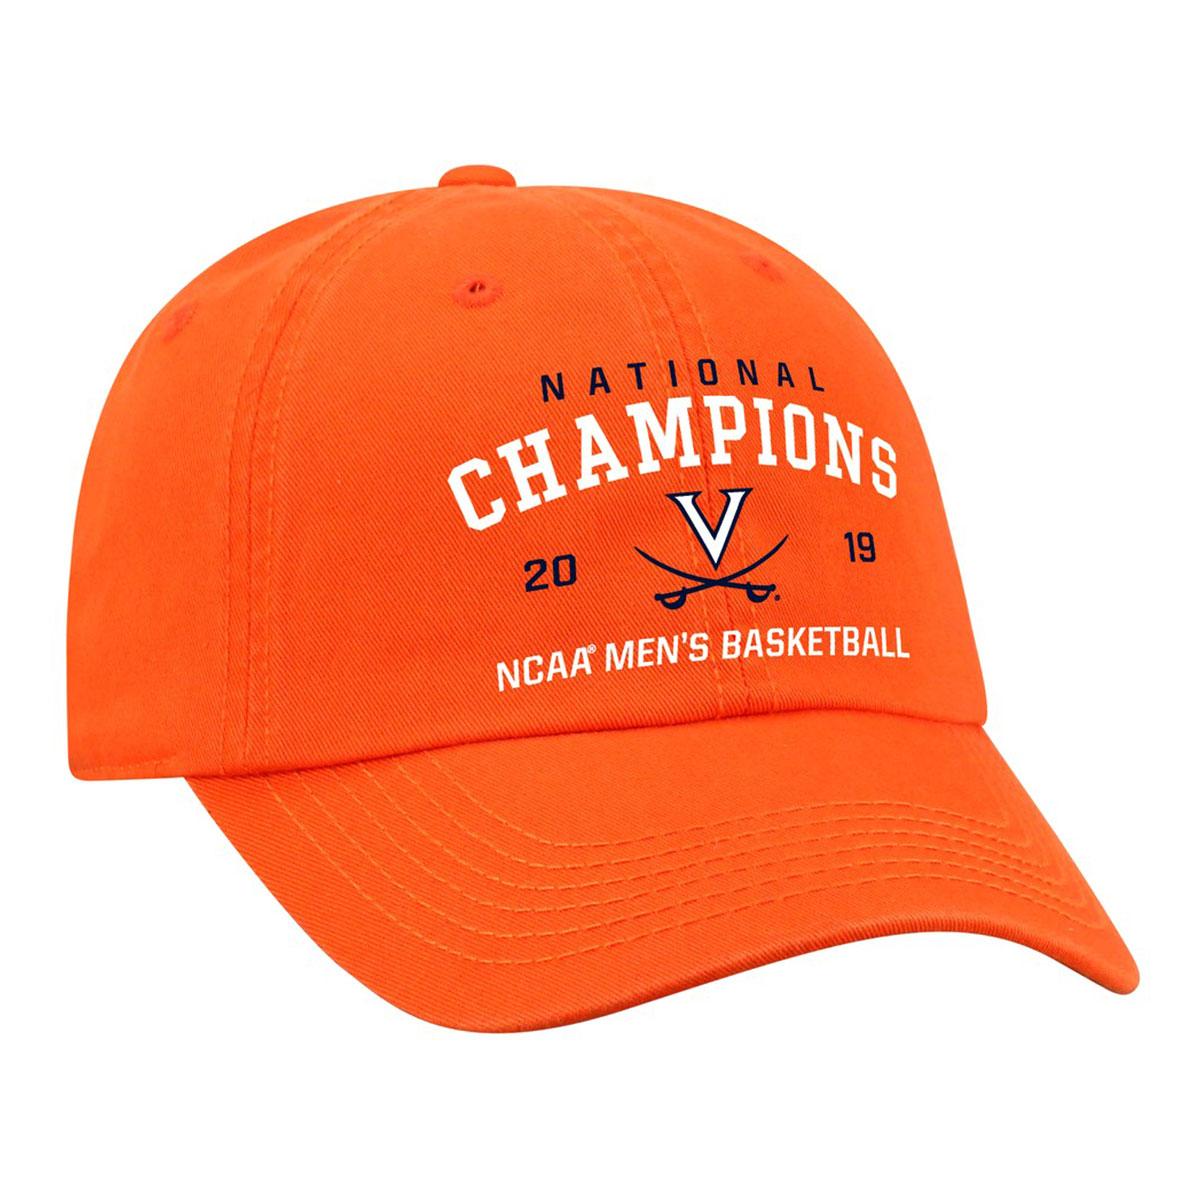 2019 National Champions Classic Hat